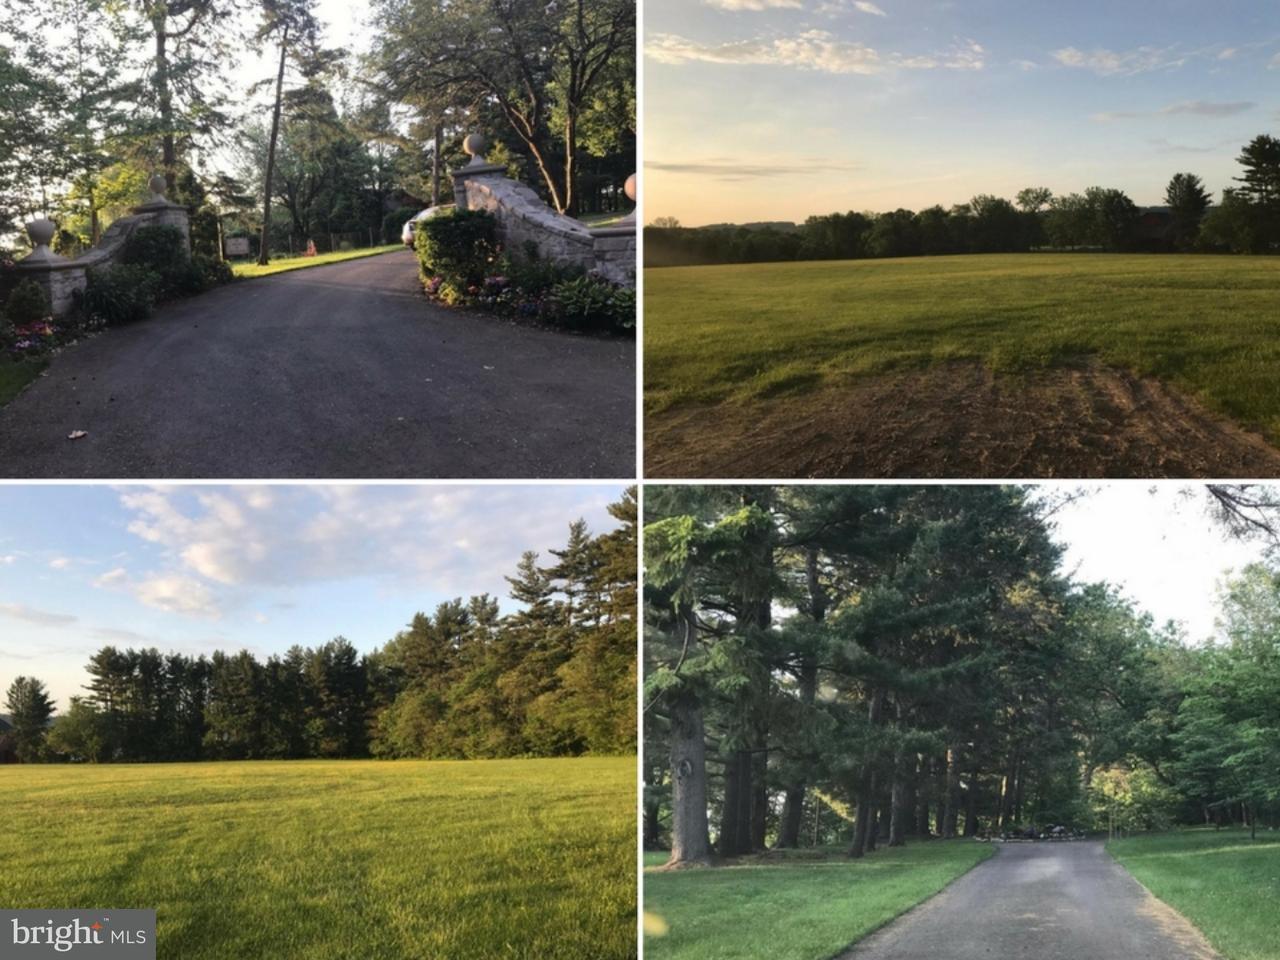 Fazenda / Quinta para Venda às 2955 WINDY BUSH Road Newtown, Pensilvânia 18940 Estados Unidos